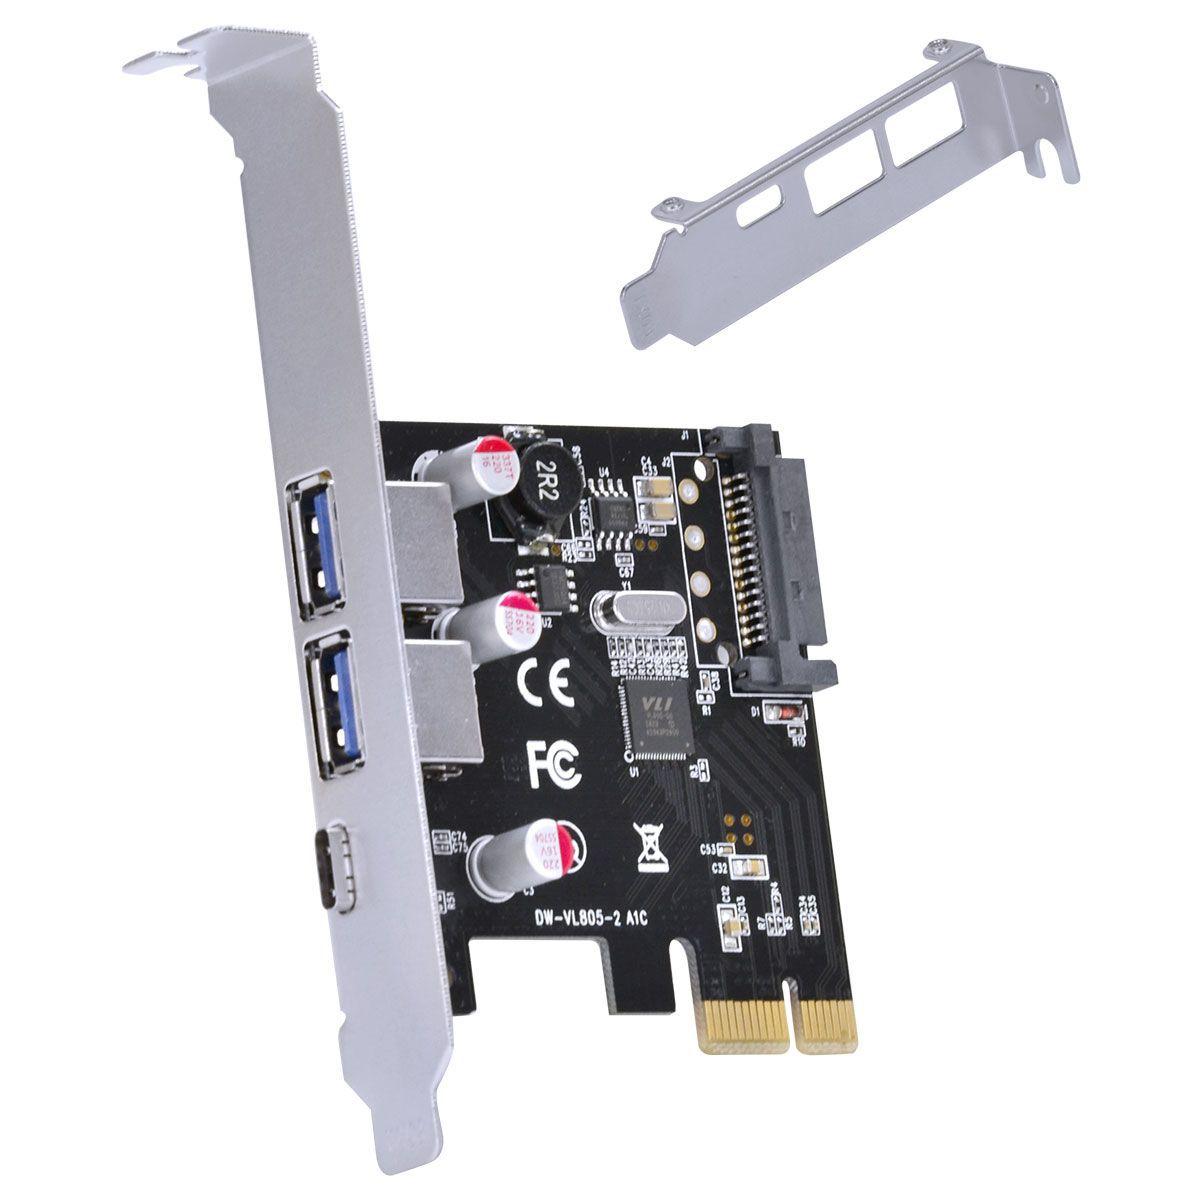 PLACA USB COM 2 USB 3.0 + USB TIPO C 3.1 PCI EXPRESS PCI-E X1 COM LOW PROFILE - P2U30C31-LP vinik